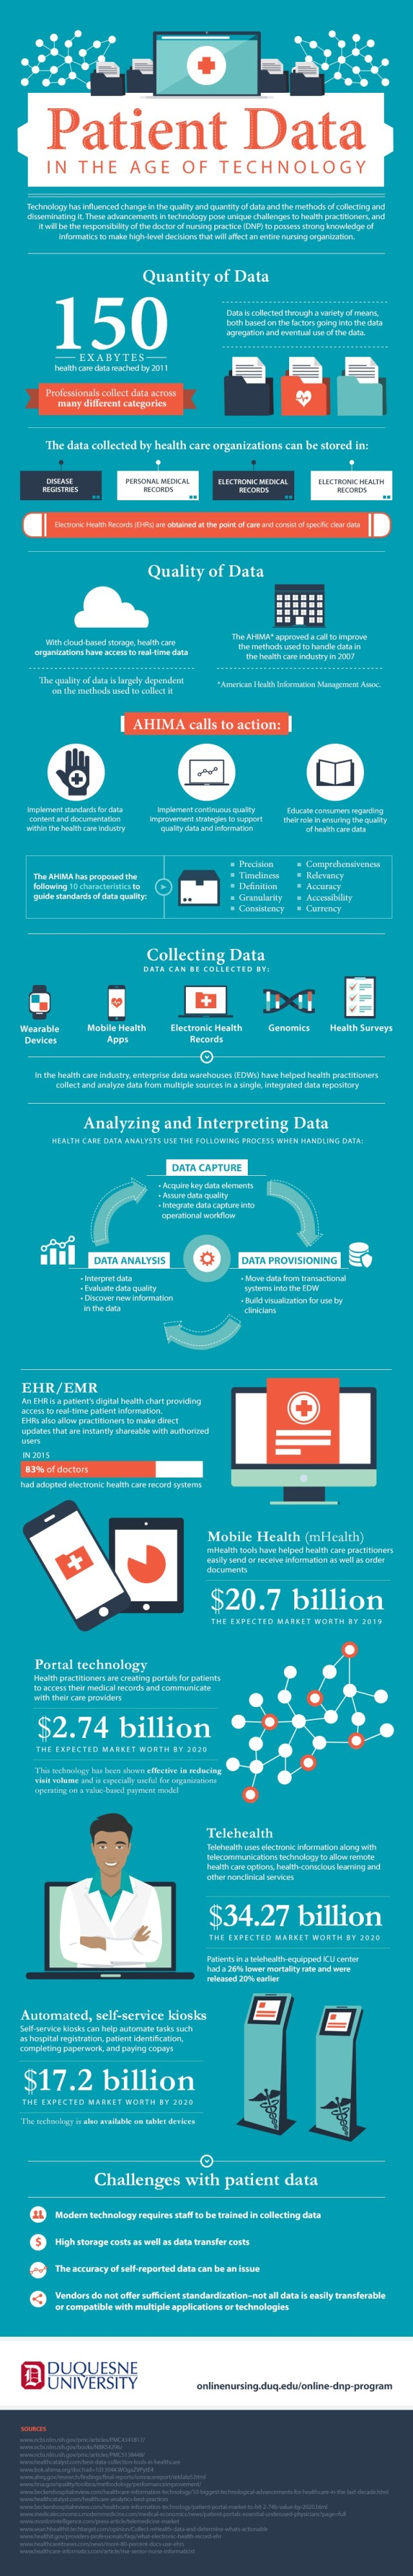 nursing patient data infographic